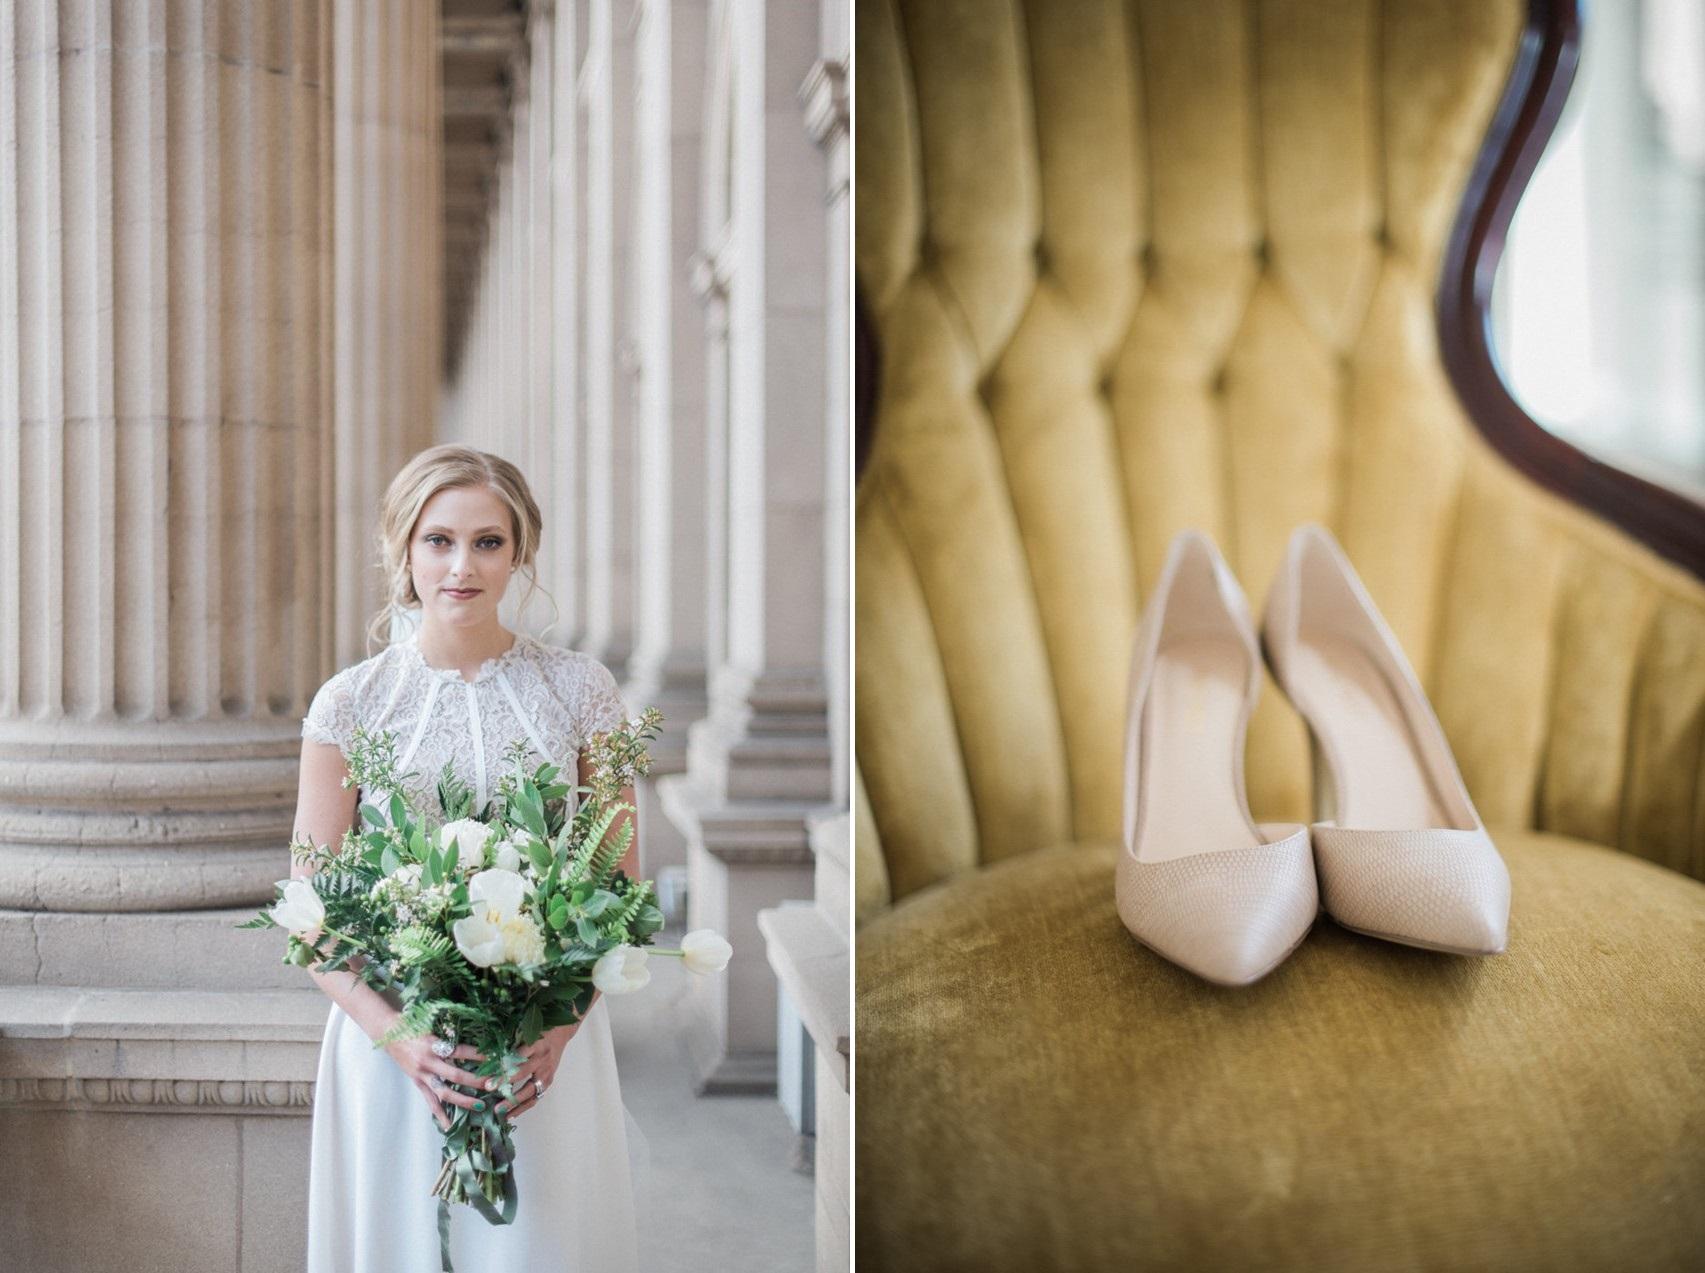 Greenery Vintage Bride & Bridal Shoes